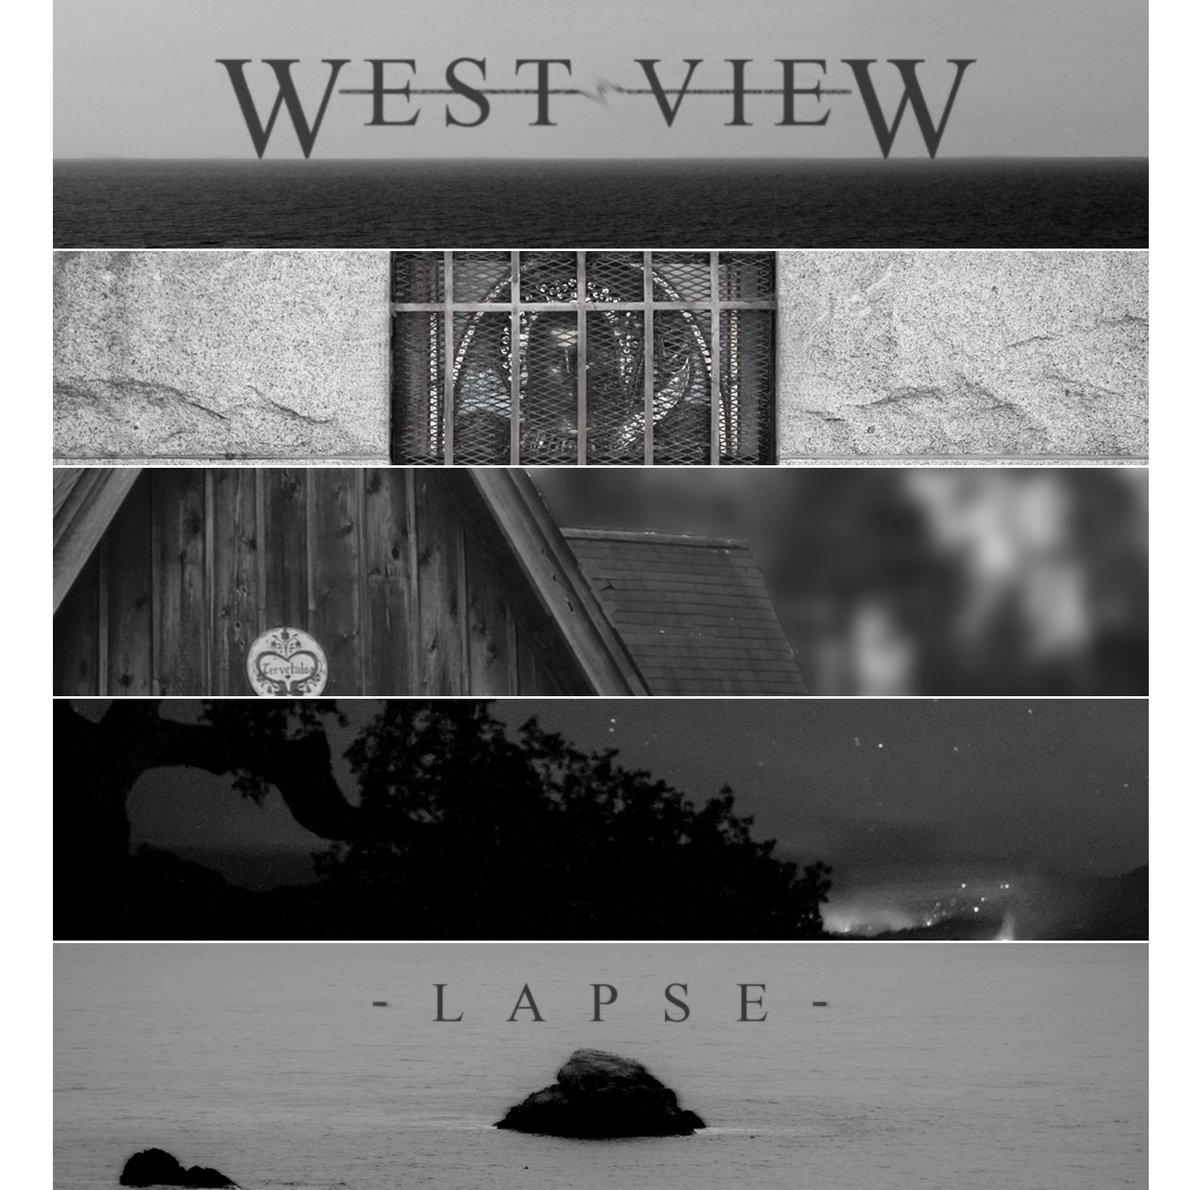 www.facebook.com/westviewmke